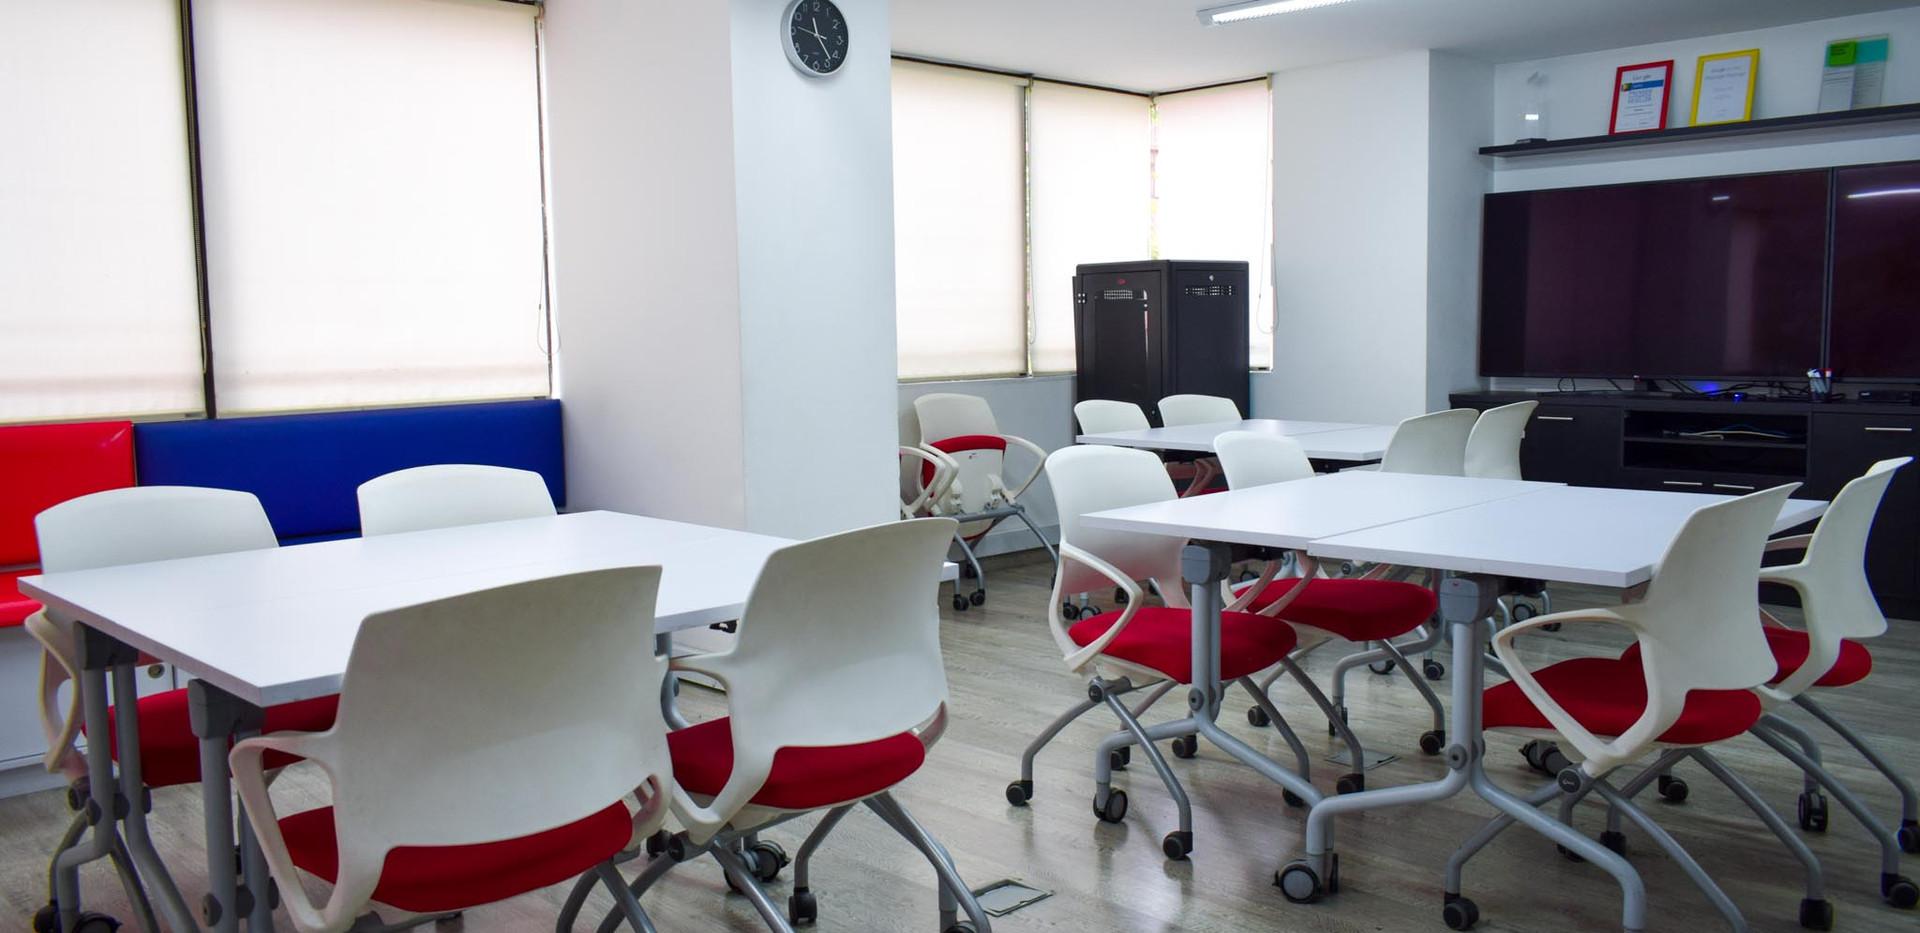 oficinas-coworking.jpg